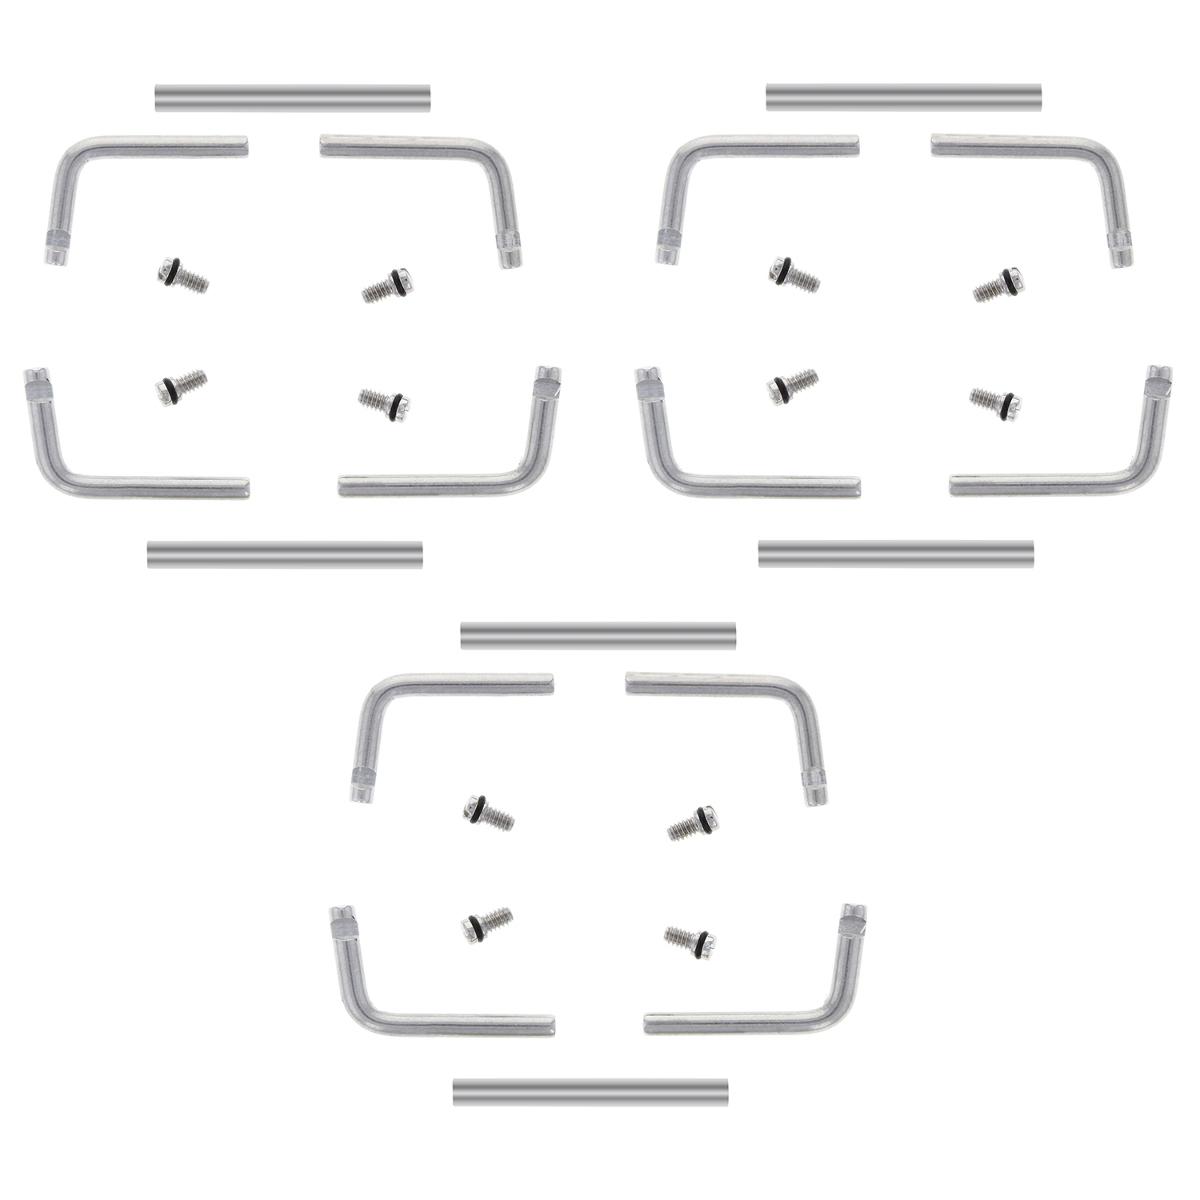 3 Set Bar Screw Connector For Pam 292 Ceramic Radiomir